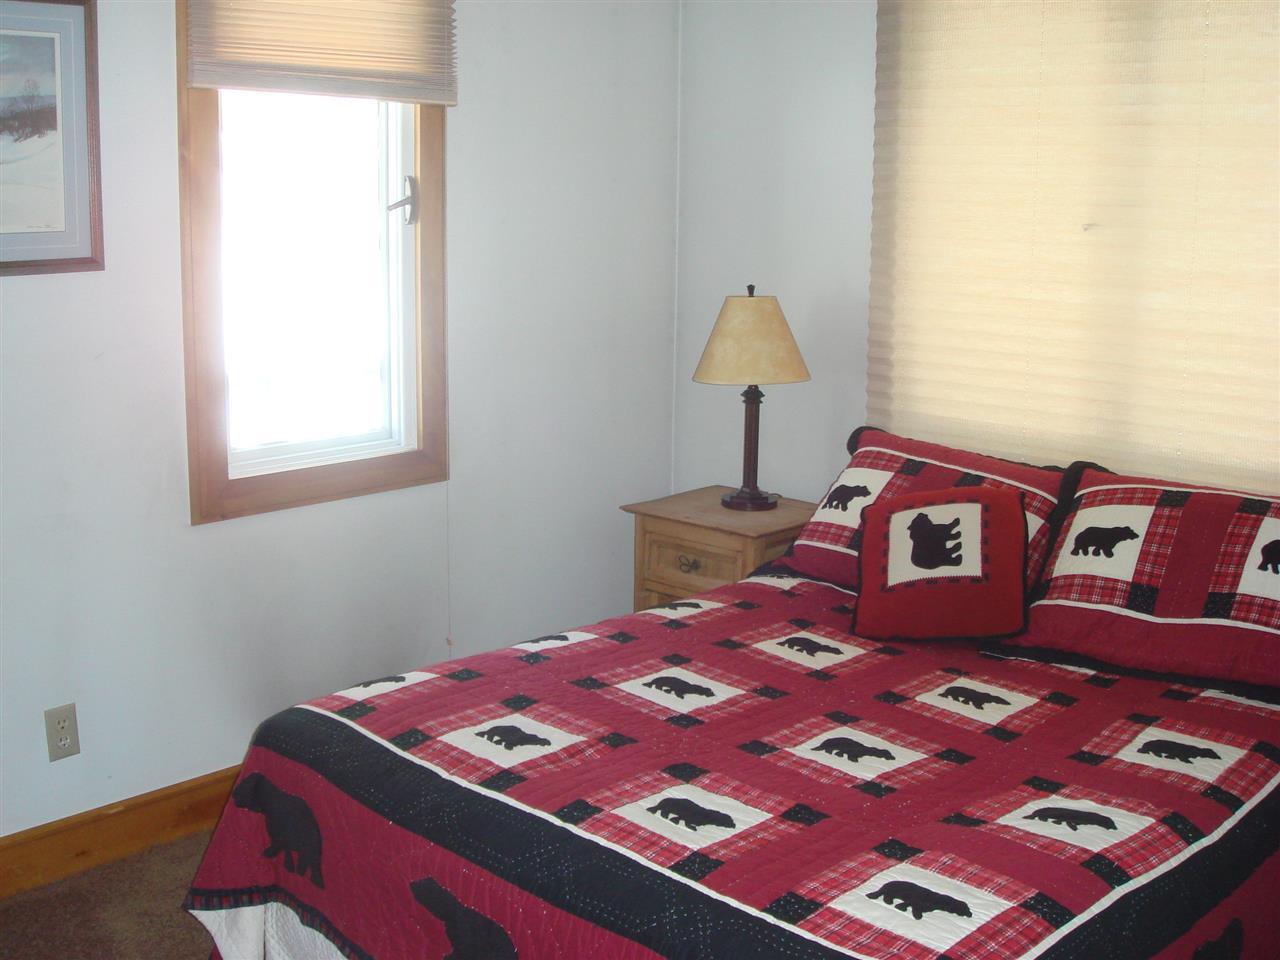 Mount-Snow-Real-Estate-4614113-17